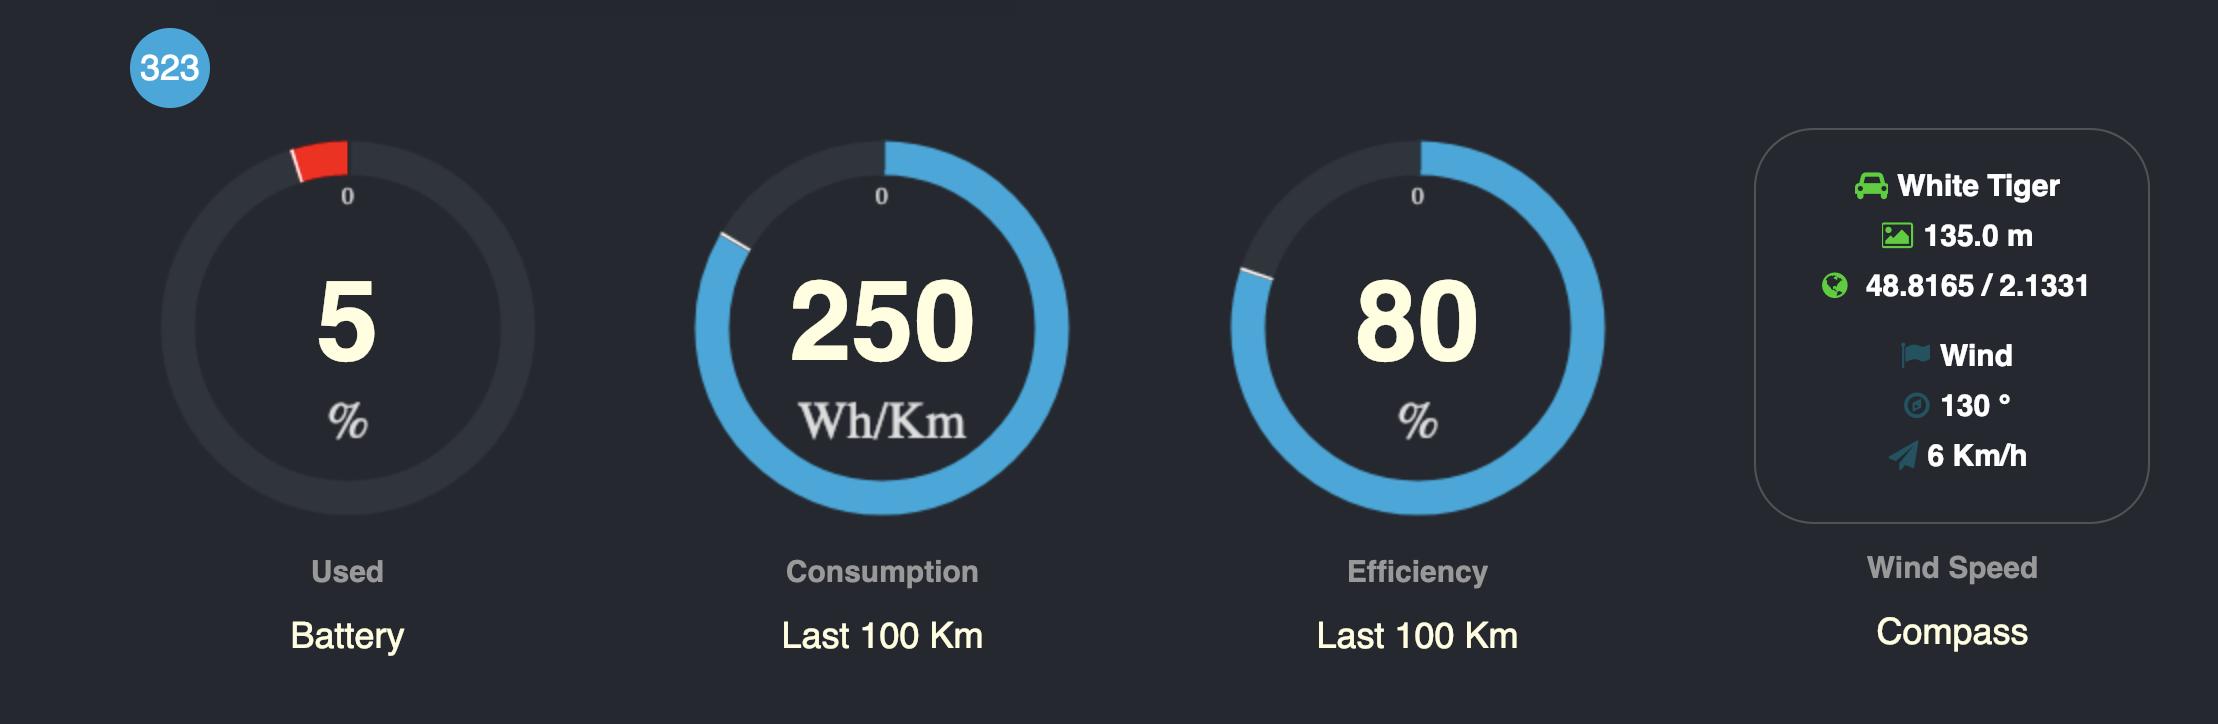 The in car App - my tesla-4u com - T4u for Tesla S/X/3